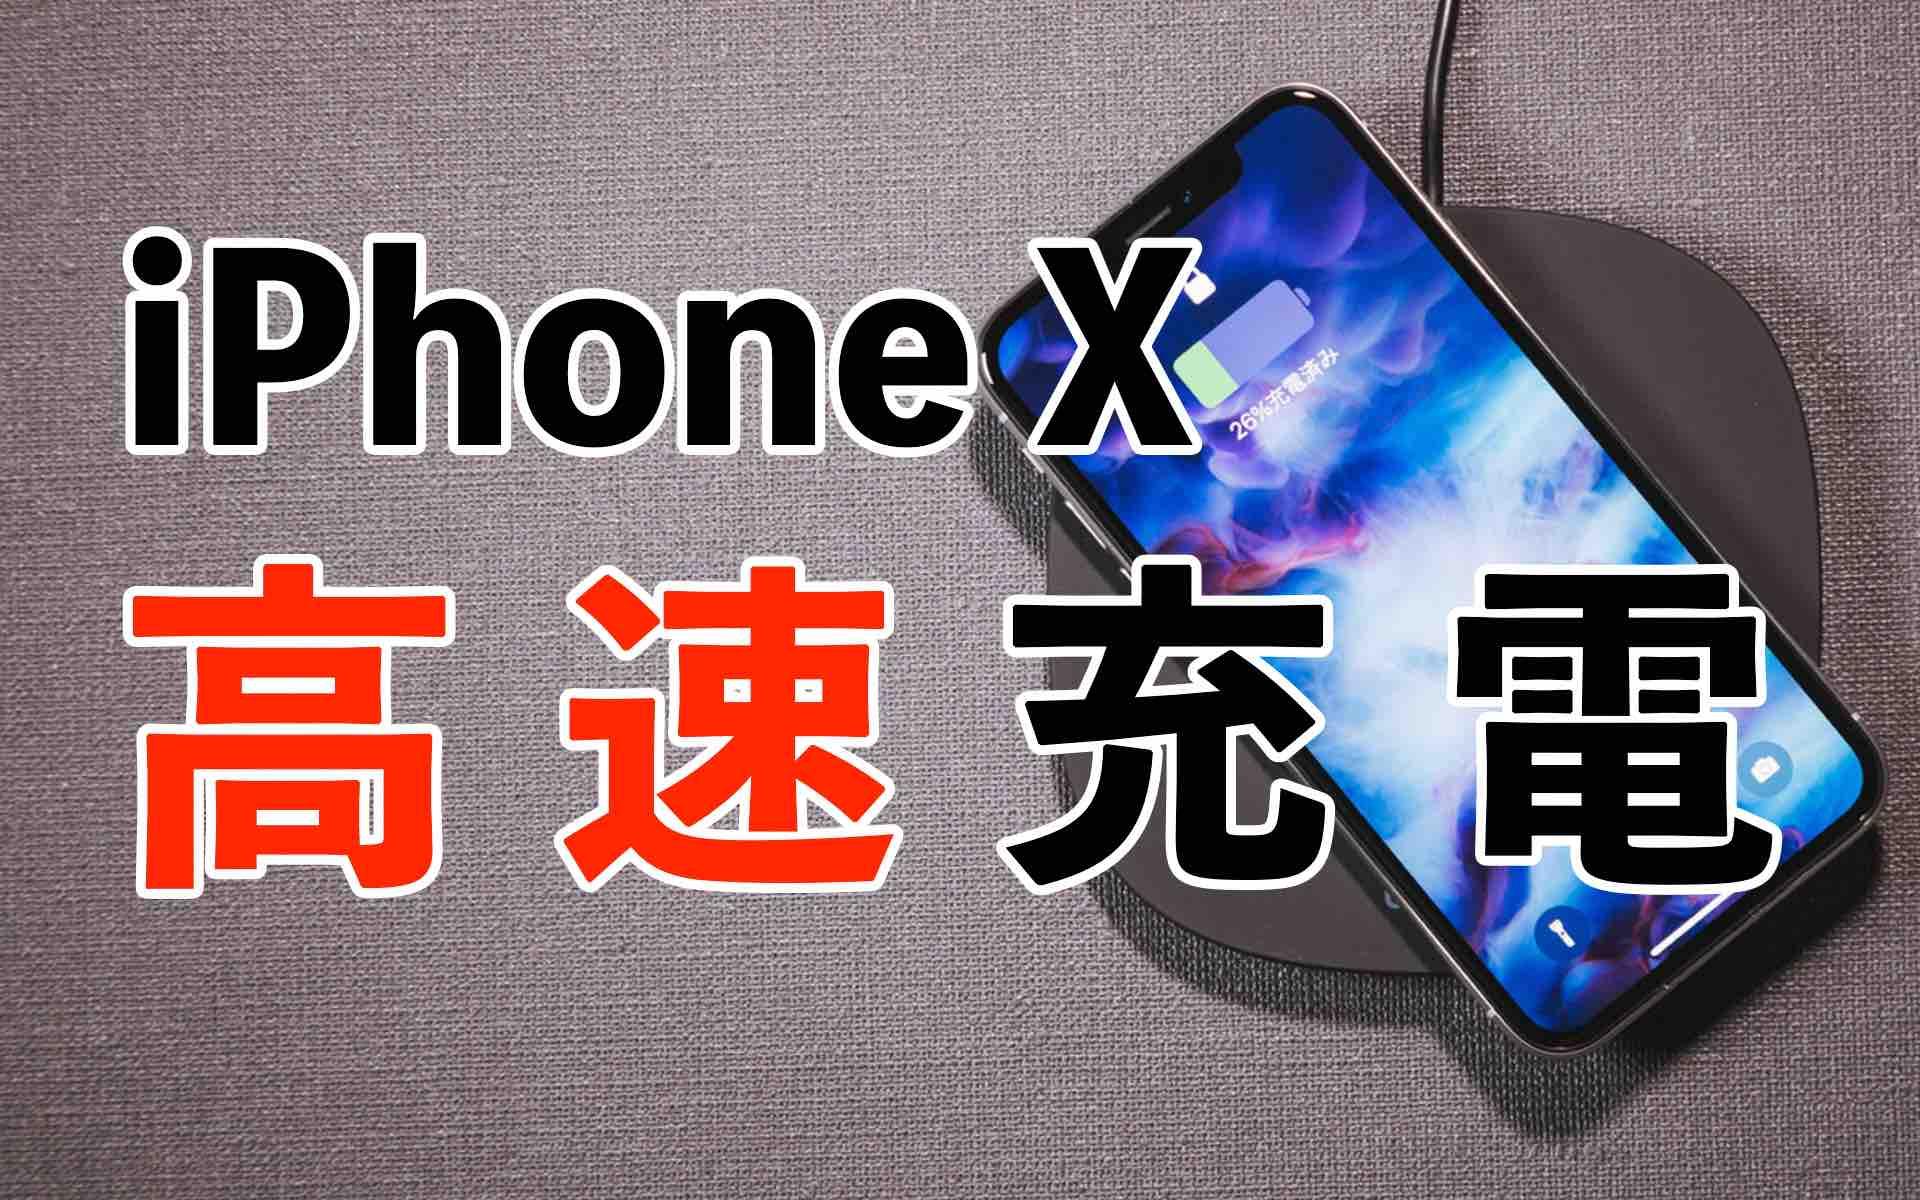 iPhoneX高速充電やバッテリー記事のアイキャッチ